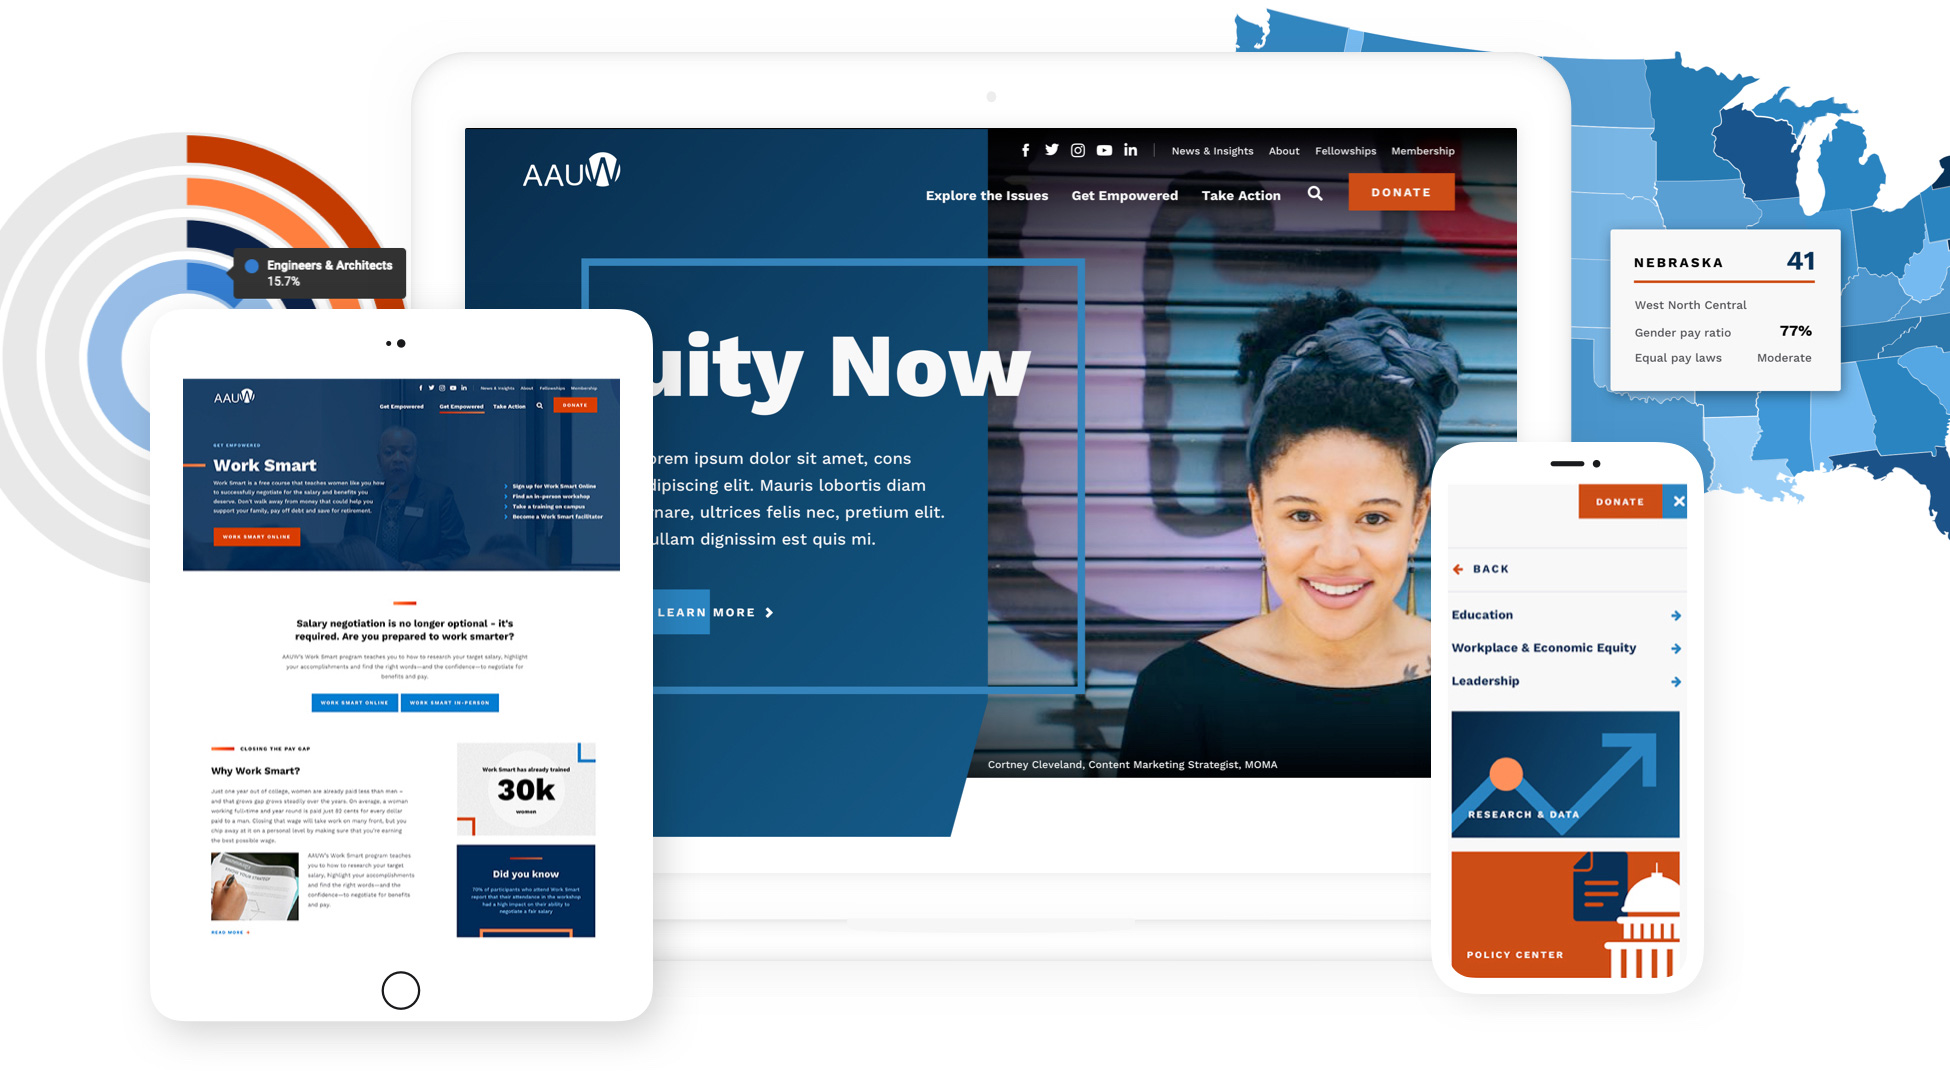 AAUW Homepage